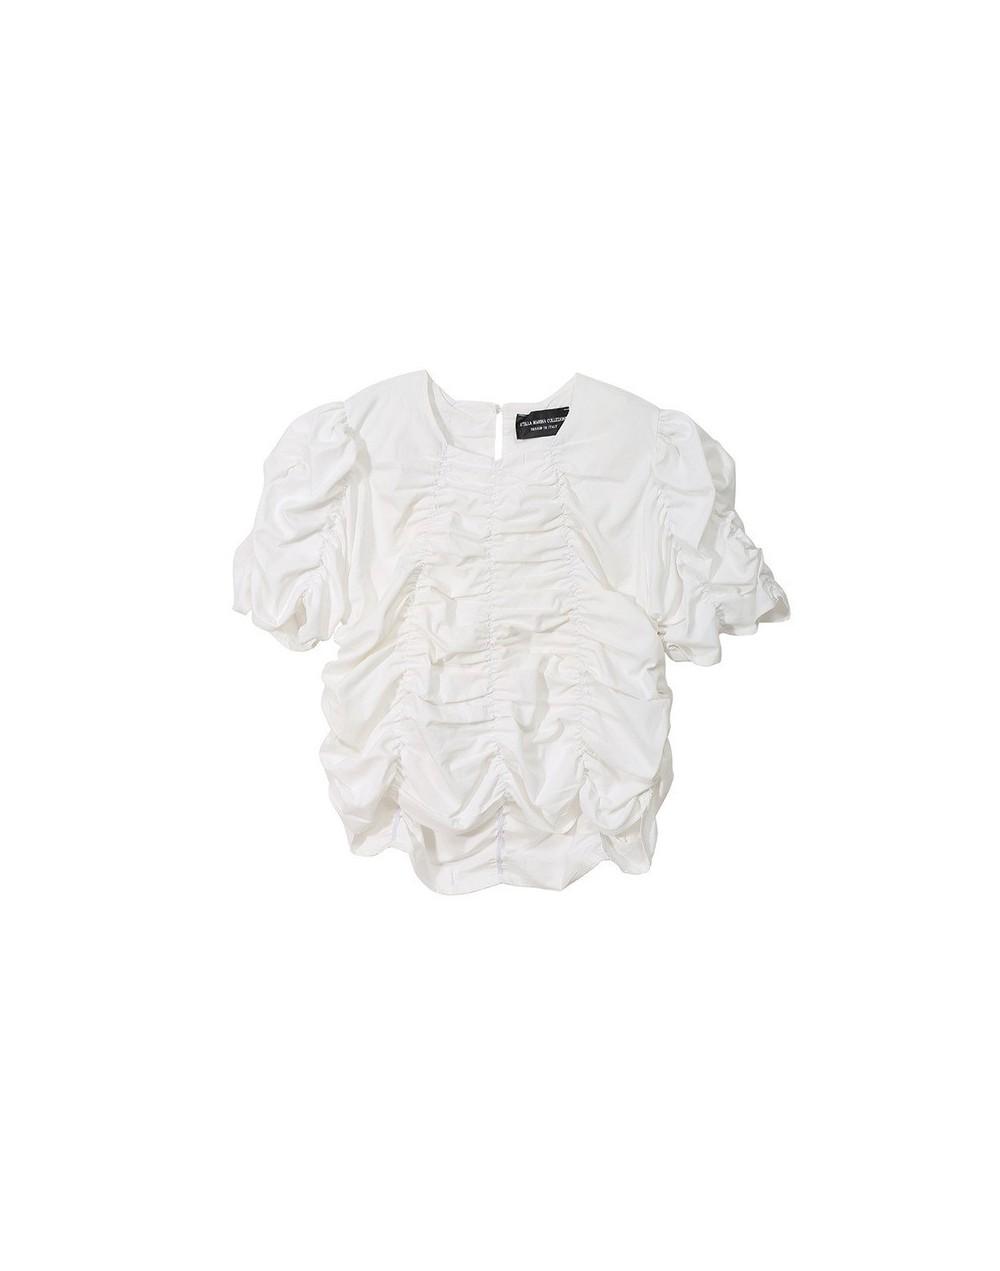 2019 New Spring Summer Round Neck Short Sleeve White Pleated Stitch Loose Personality Shirt Women Blouse Fashion JU840 - whi...